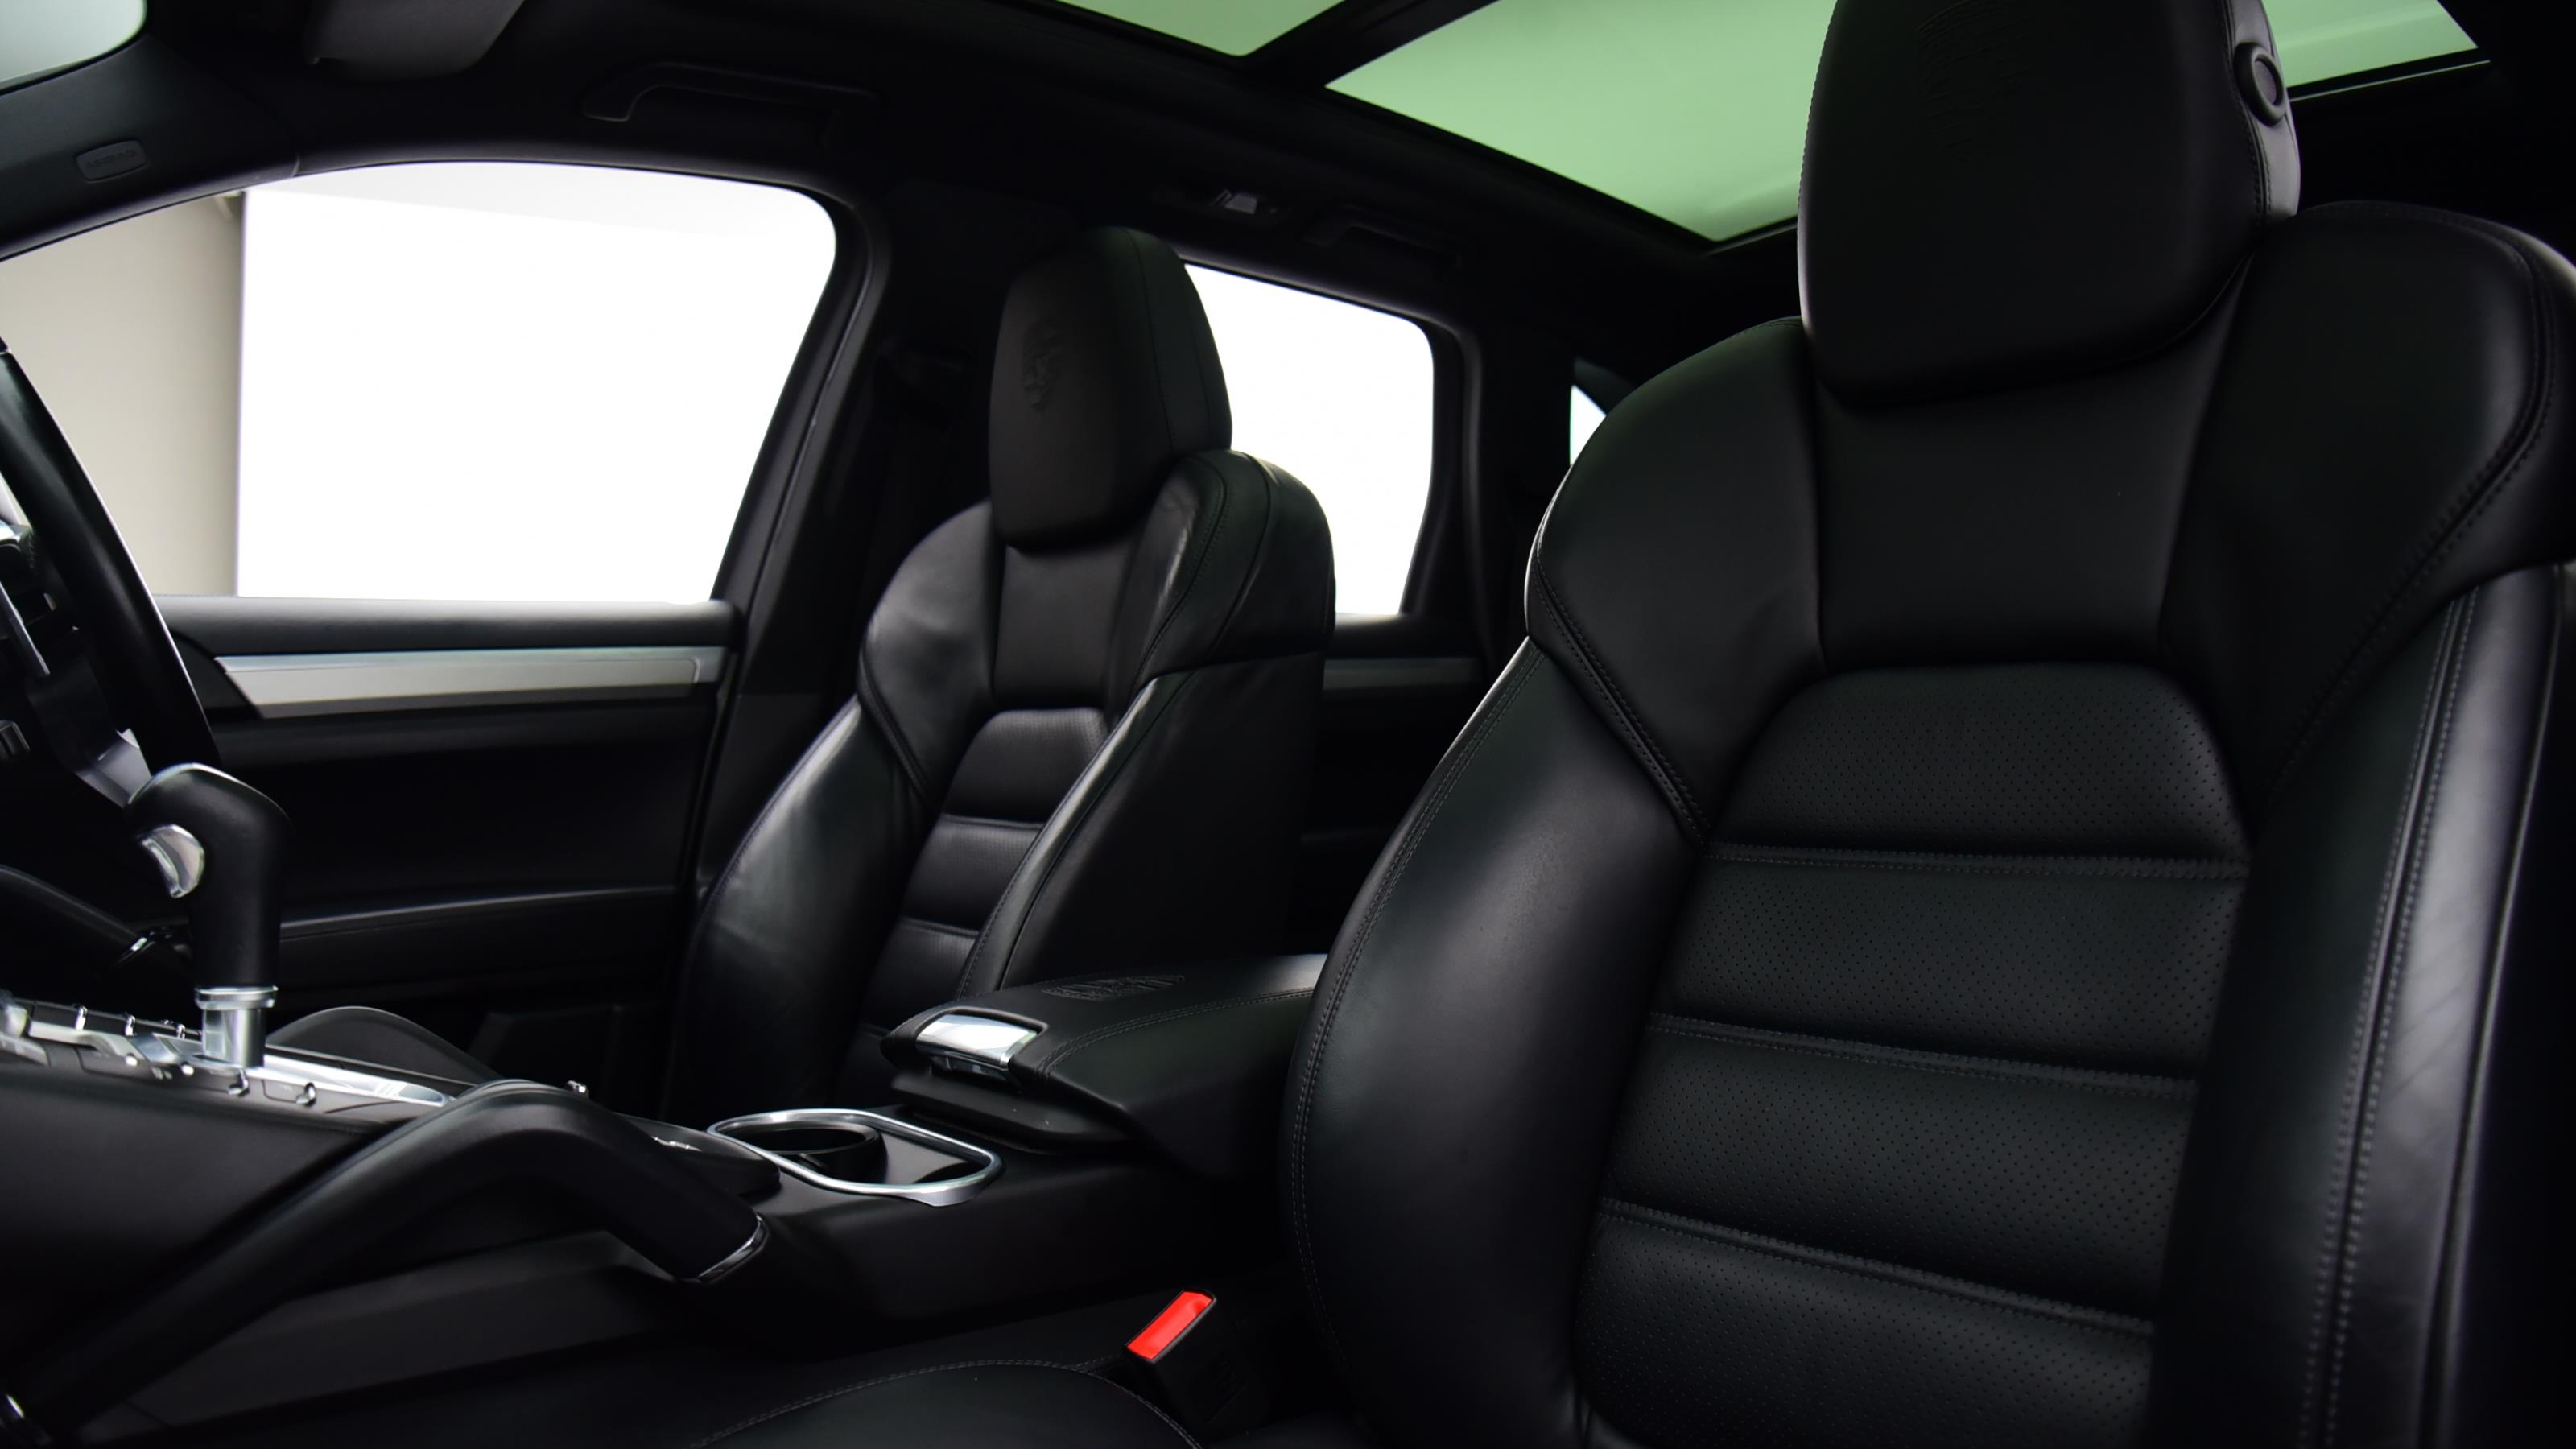 Used 2016 Porsche CAYENNE Platinum Edition Diesel 5dr Tiptronic S WHITE at Saxton4x4